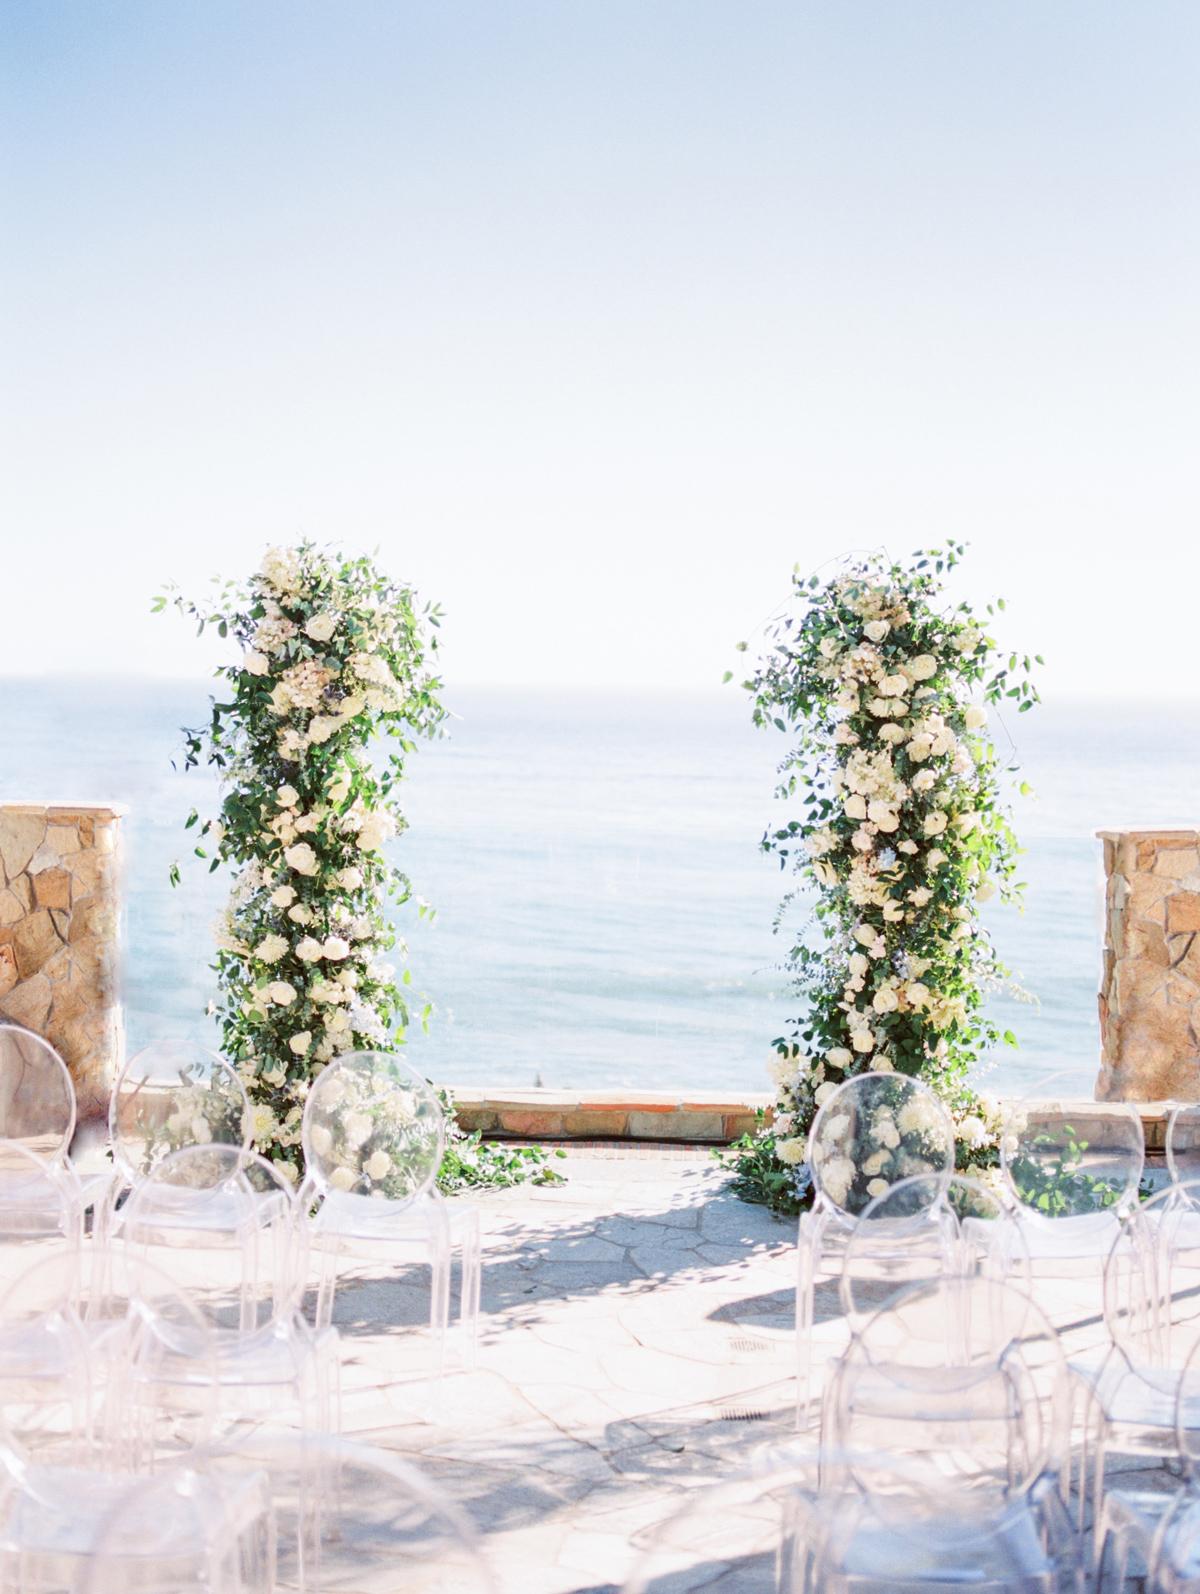 bettina gino wedding ceremony location overlooking water